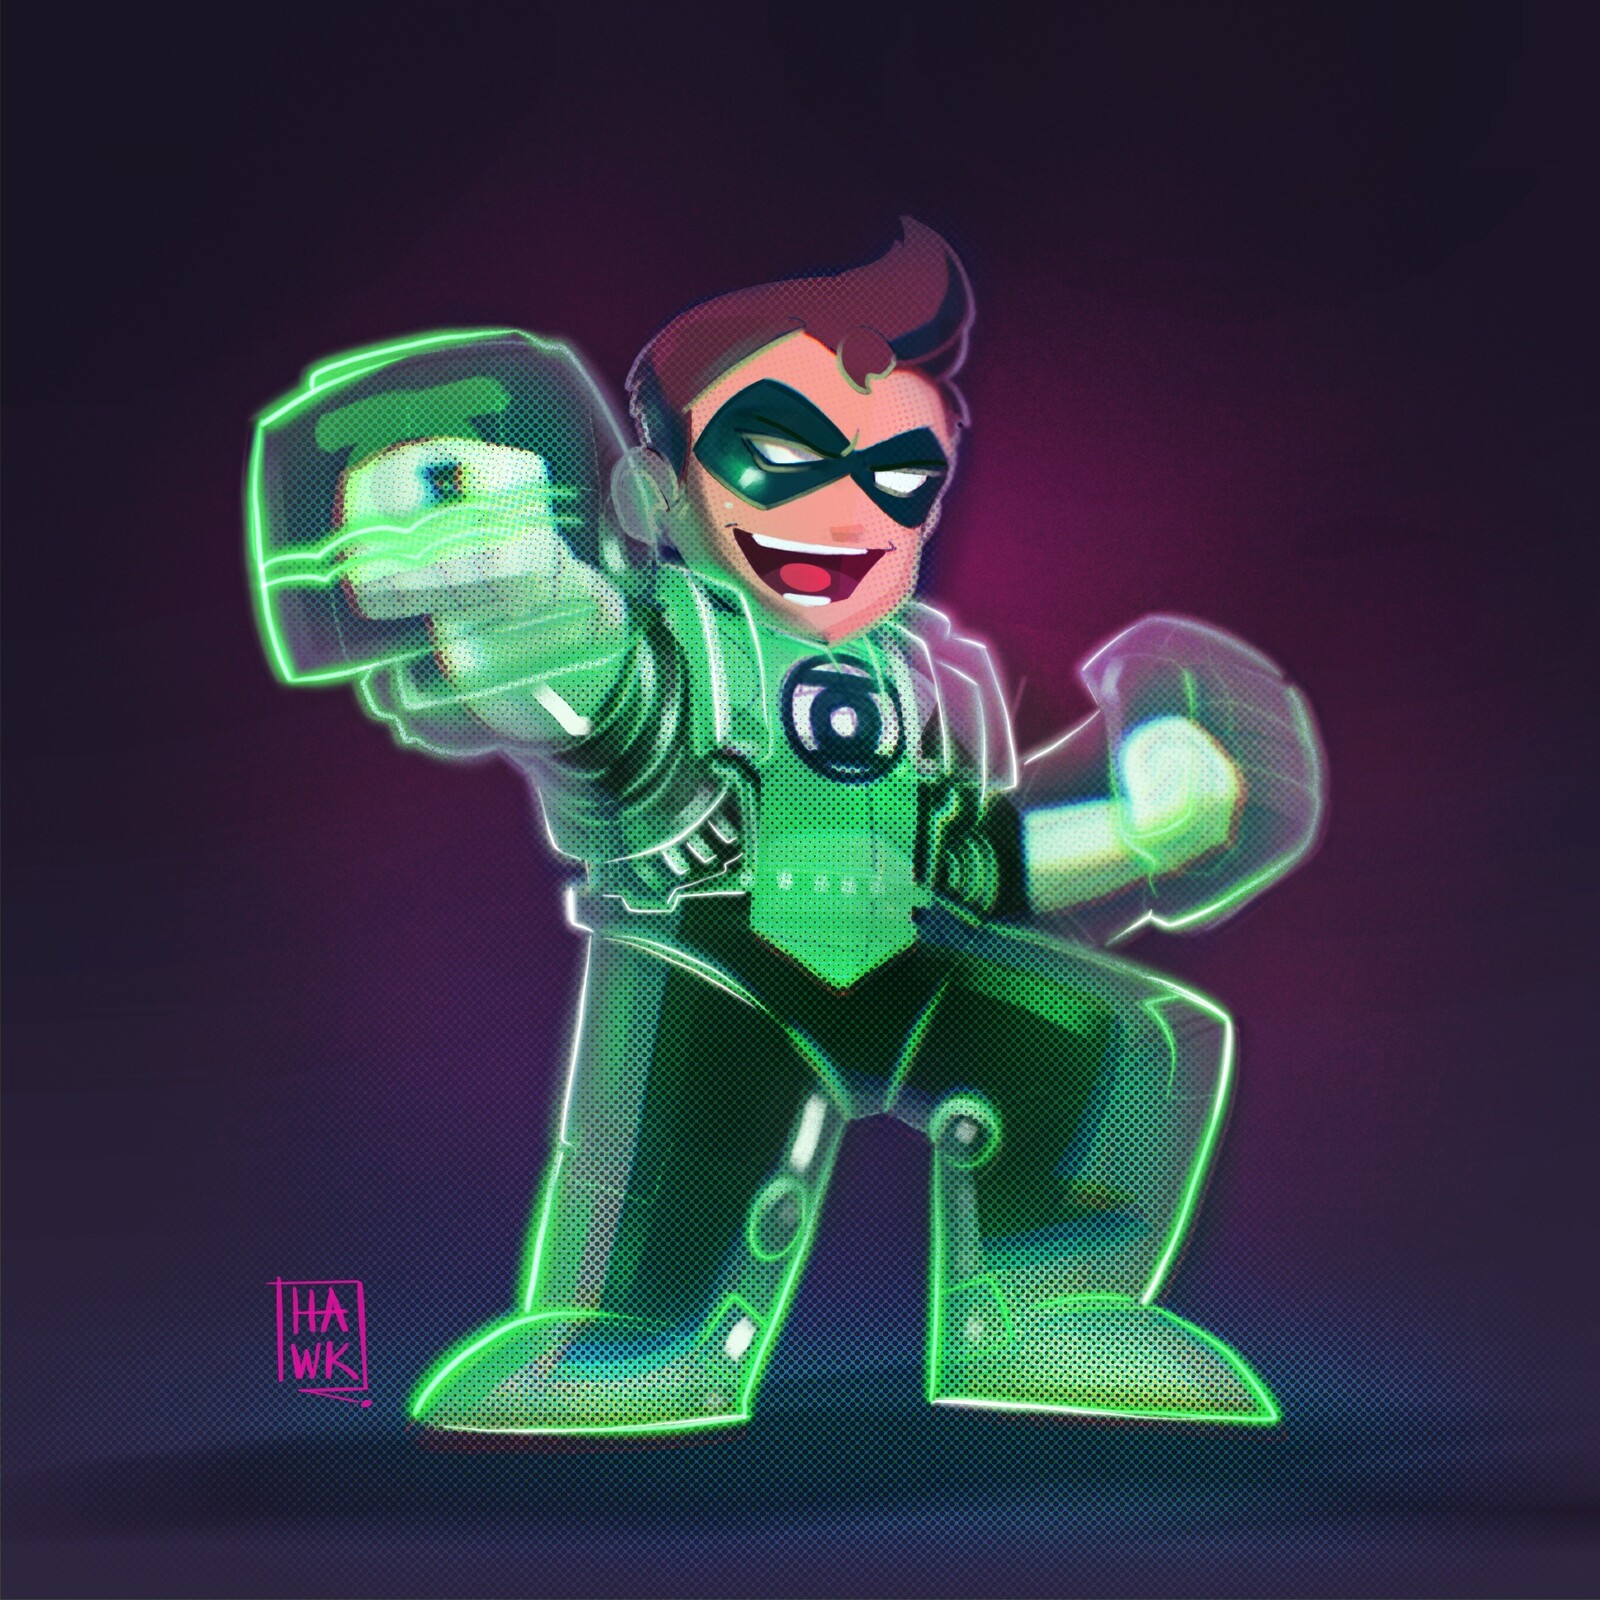 Concept: Green Lantern